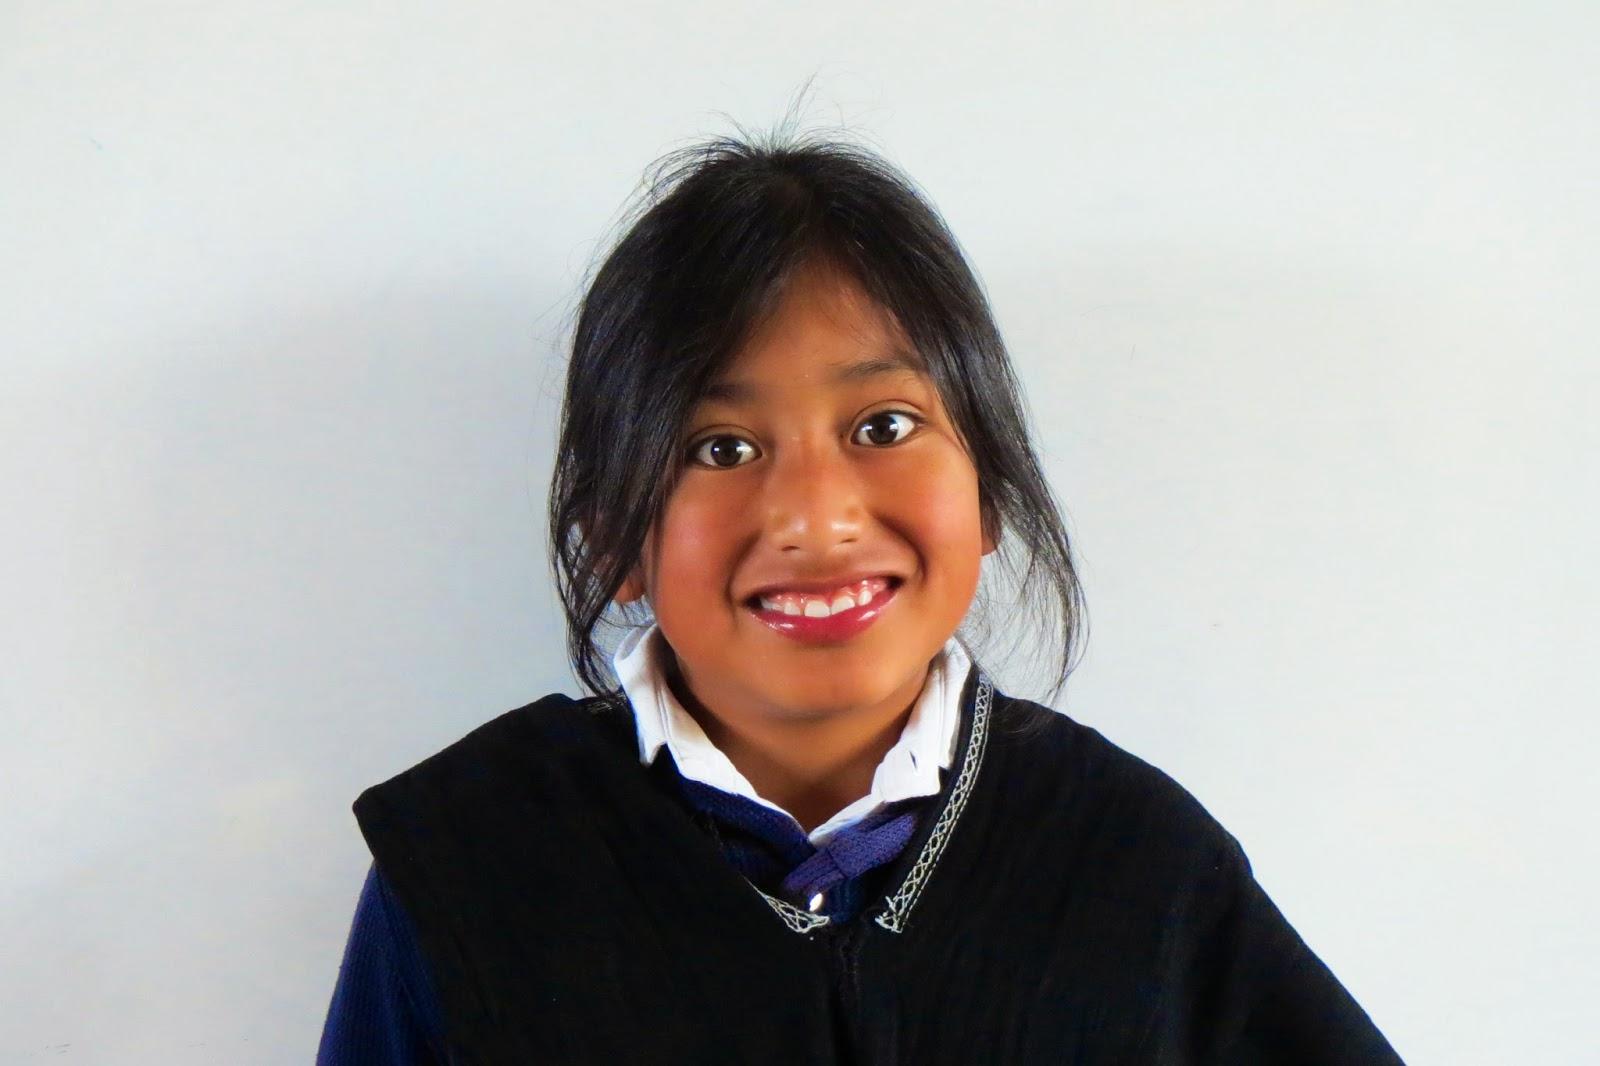 Cesar, Age 9